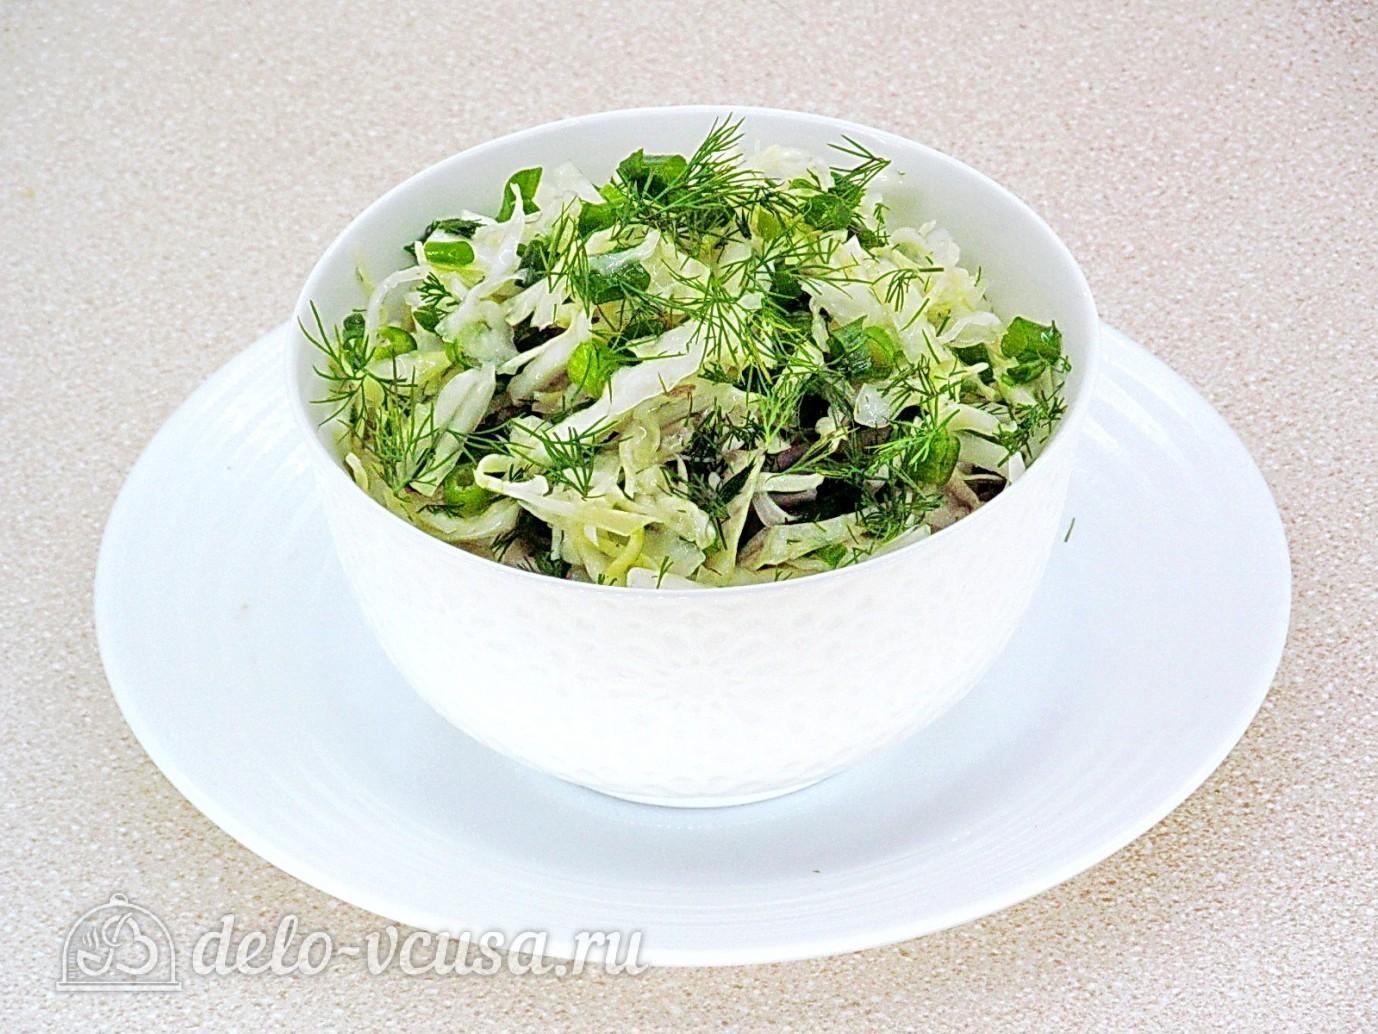 Суп из огурцов рецепты с фото